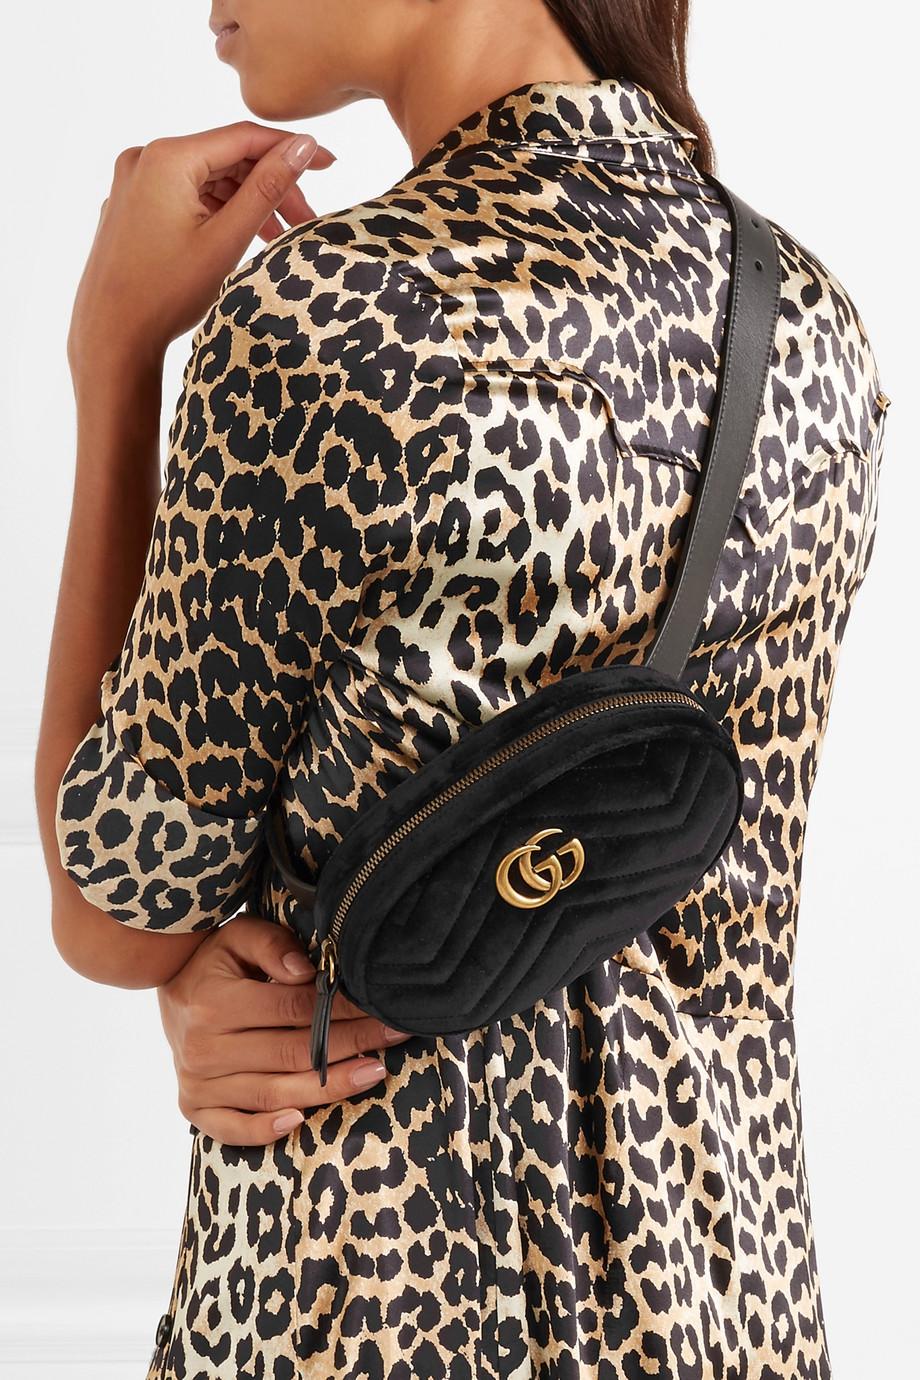 654b86734043 Gucci Waist Bag Buy | Dr.Paul